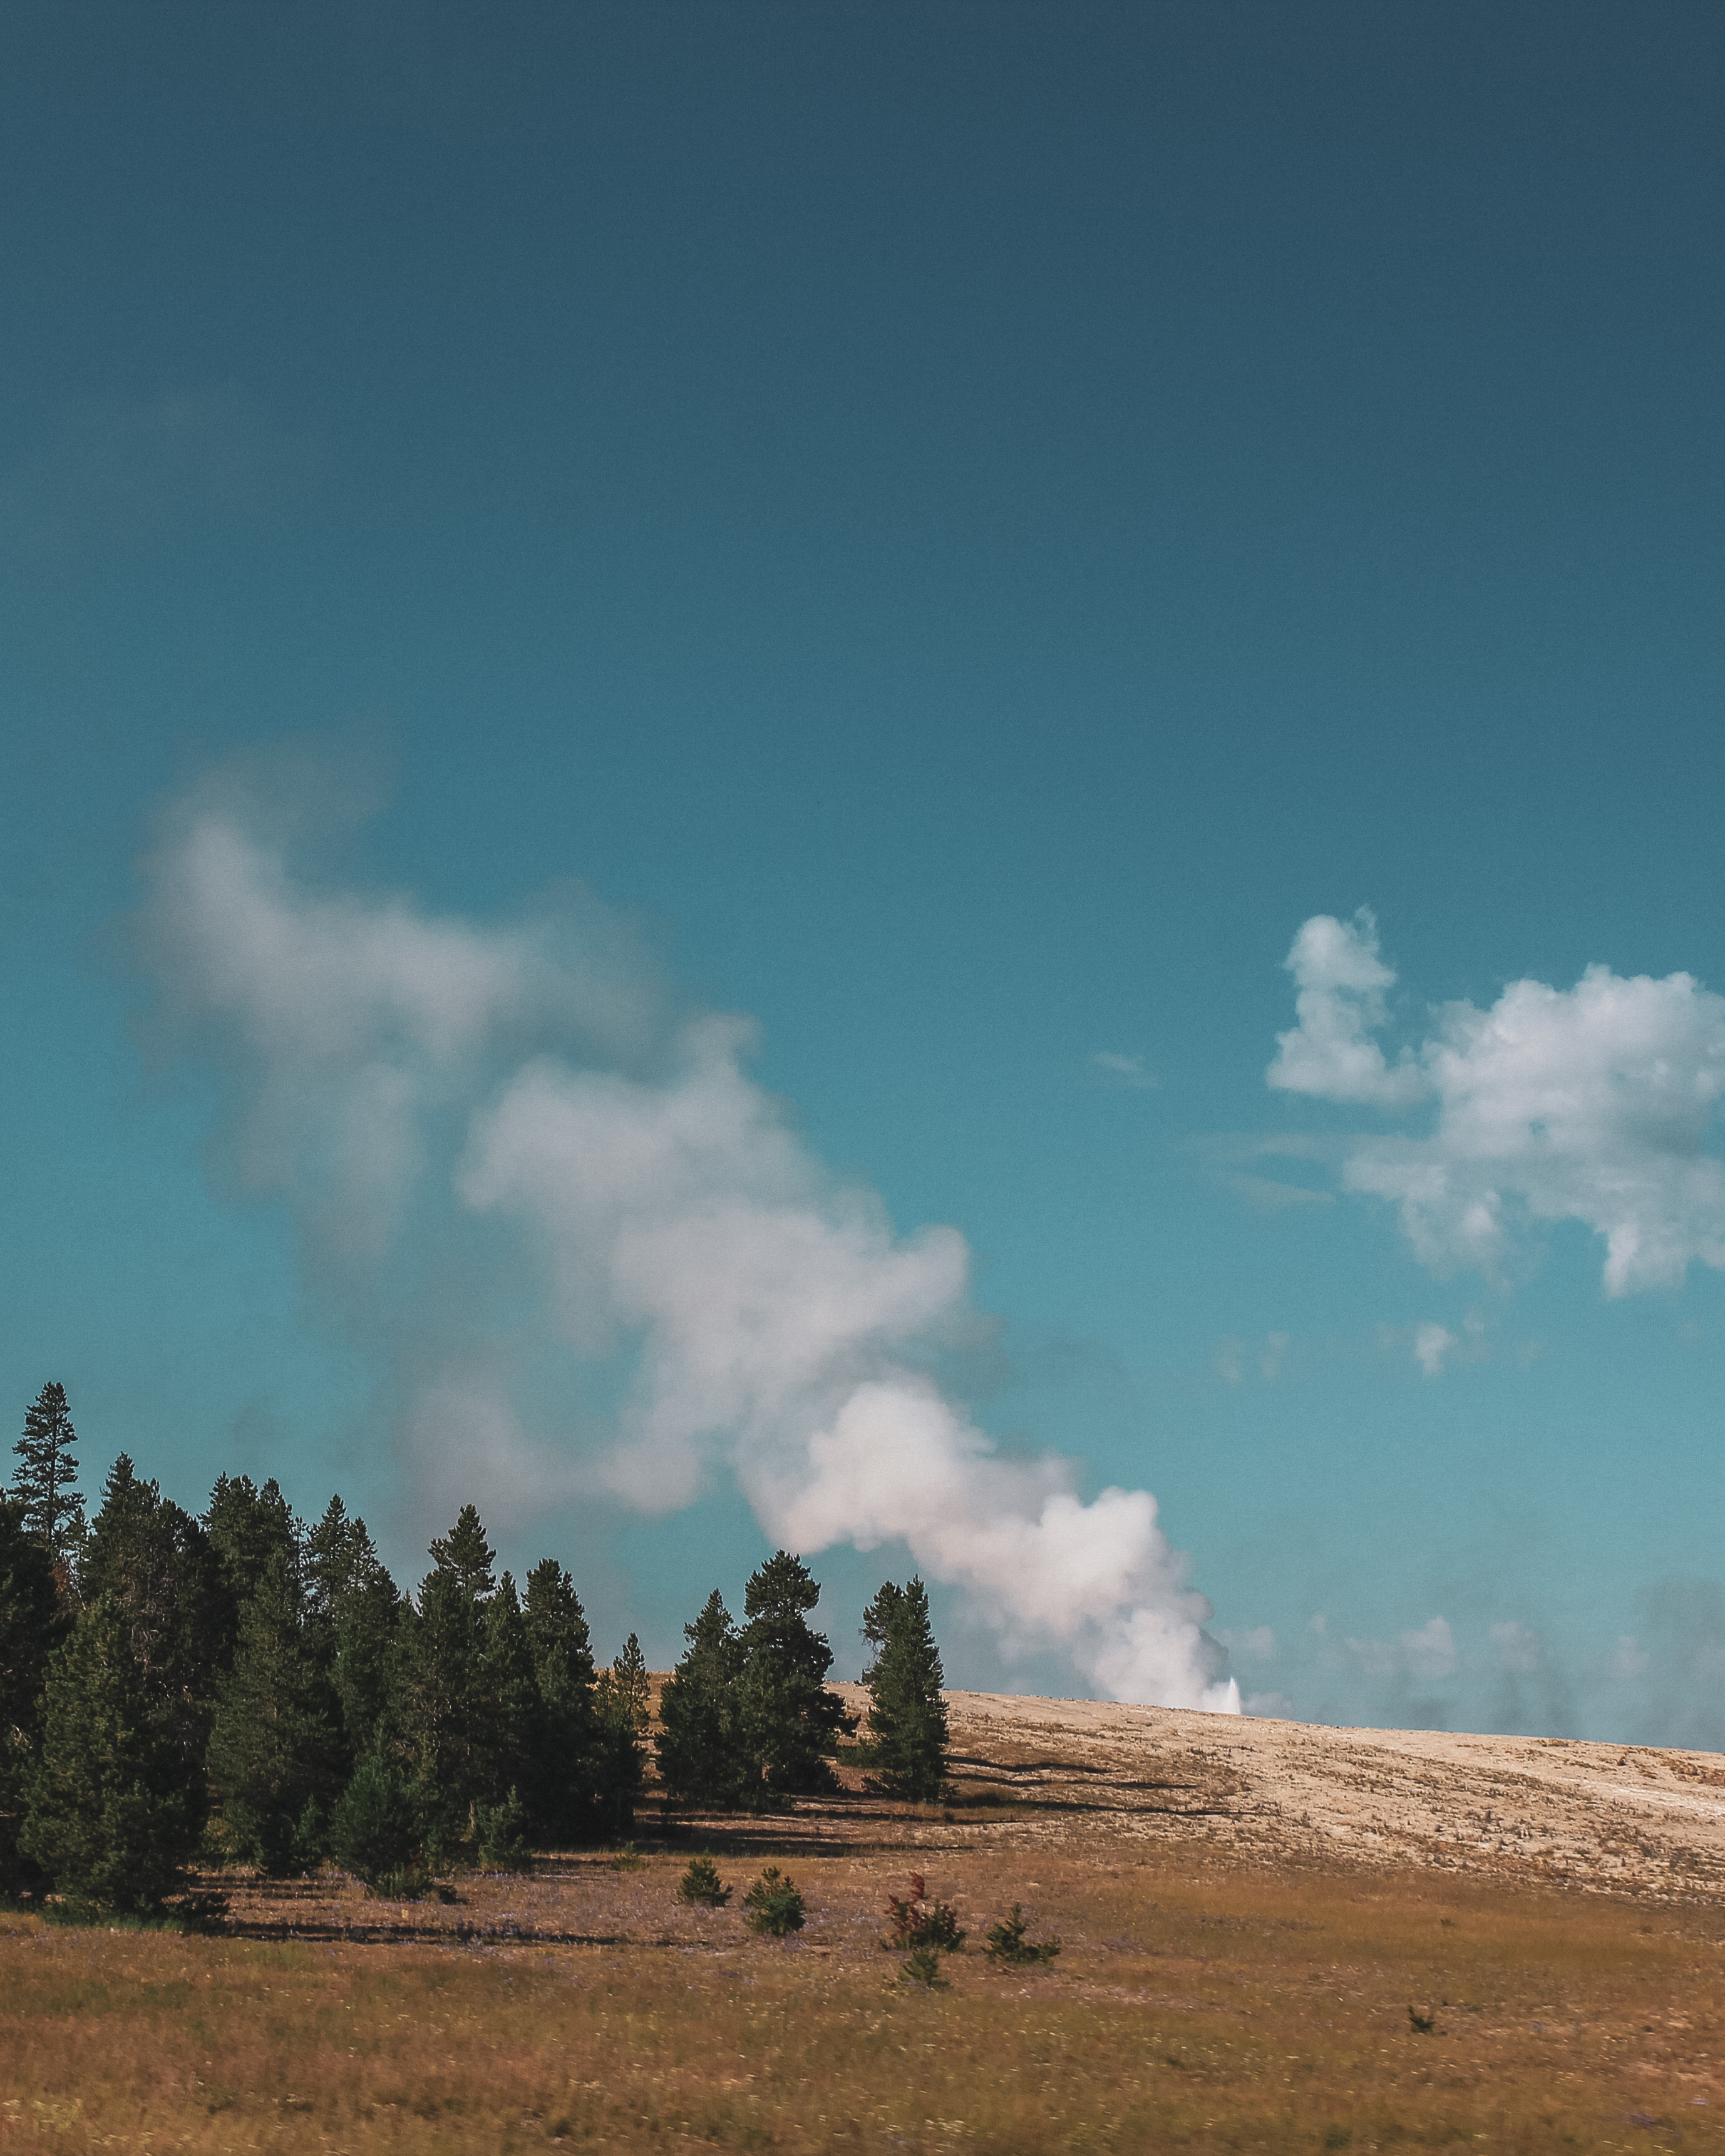 geyser Yellowstone itinerary 3 days